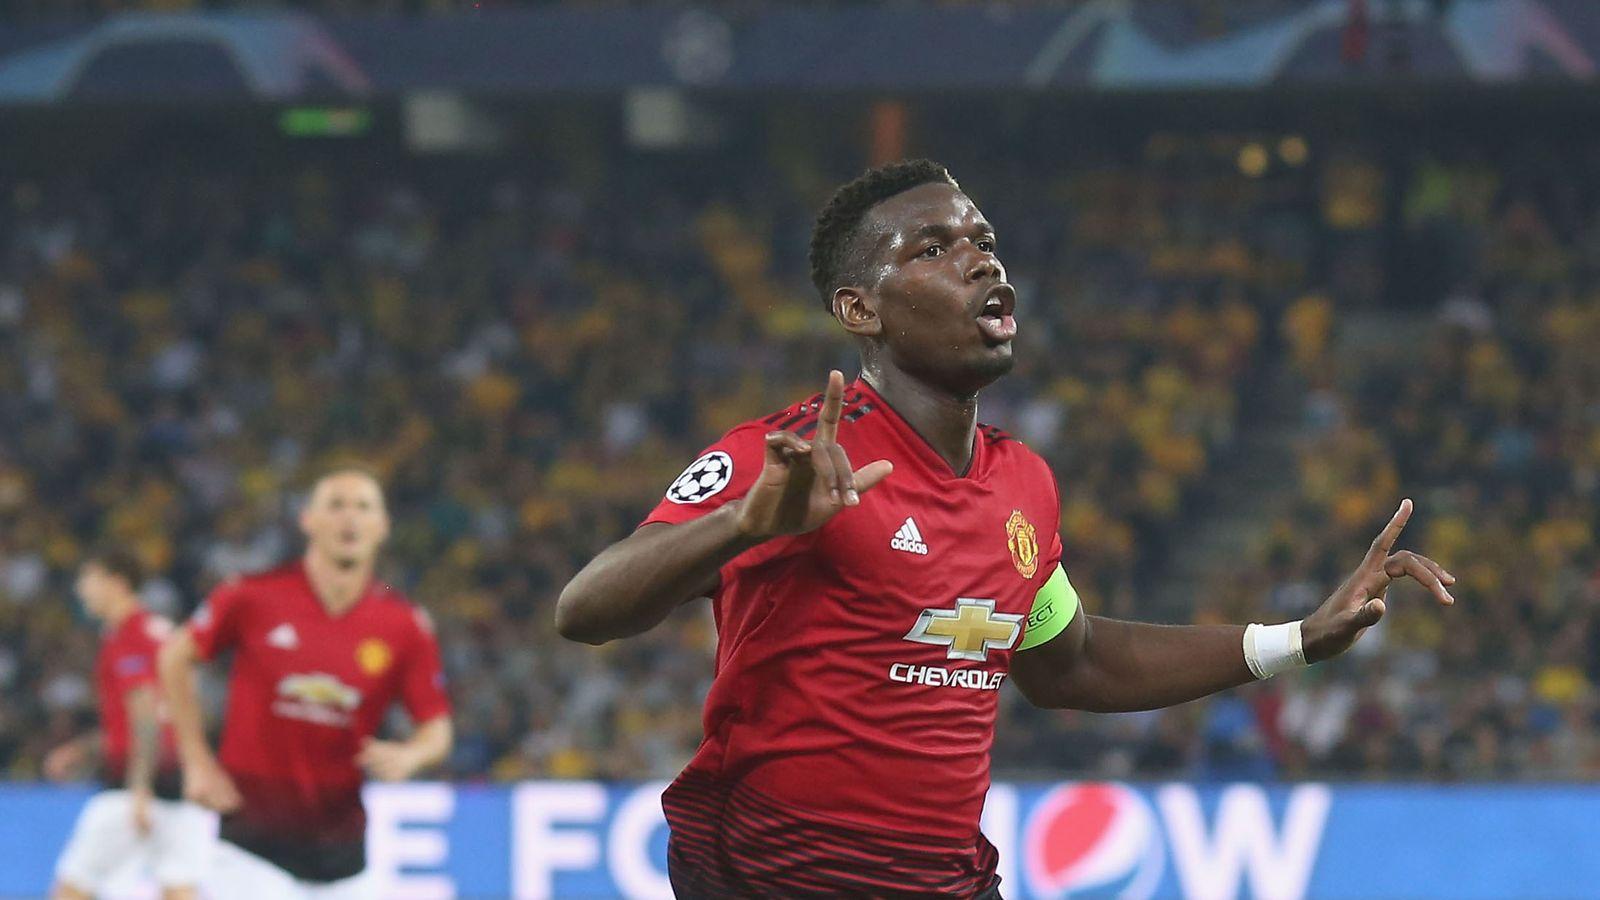 75261b0e8 Young Boys 0 - 3 Man Utd - Match Report & Highlights